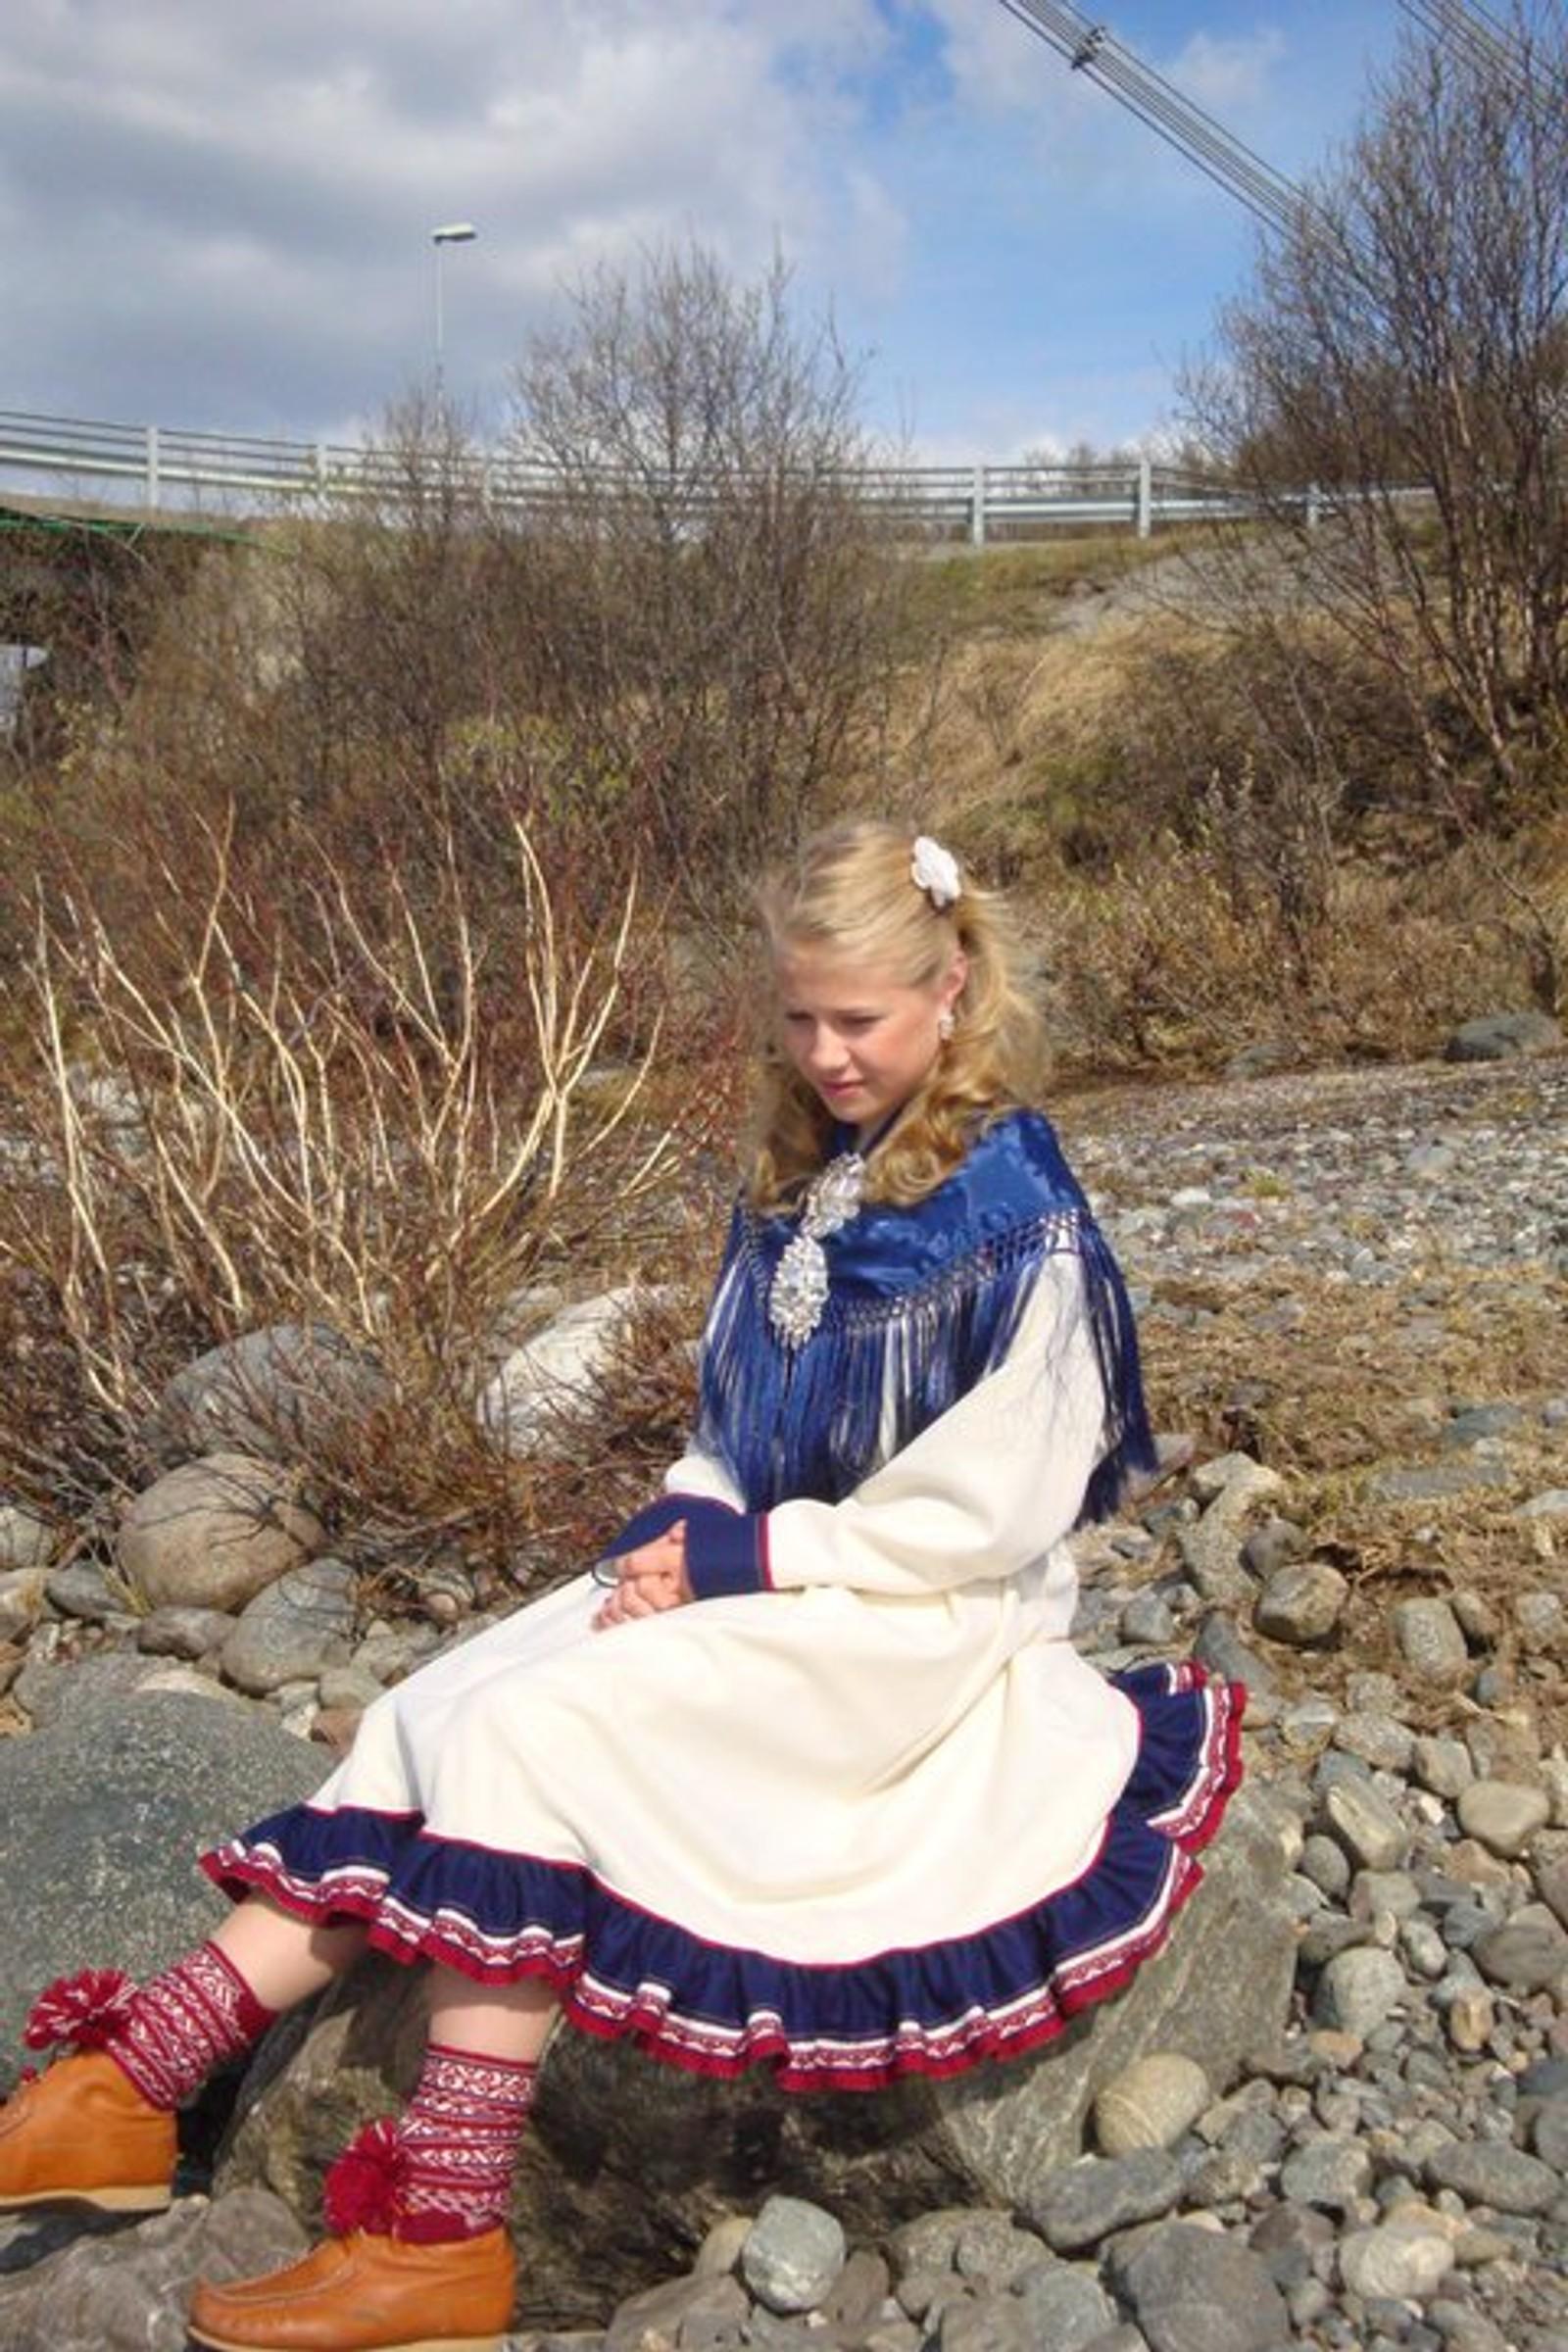 Brytetalentet Signe Marie Fidje Store (16) fra Tana i samekofte, fotografert på Tanabredden ovenfor Tanabru.